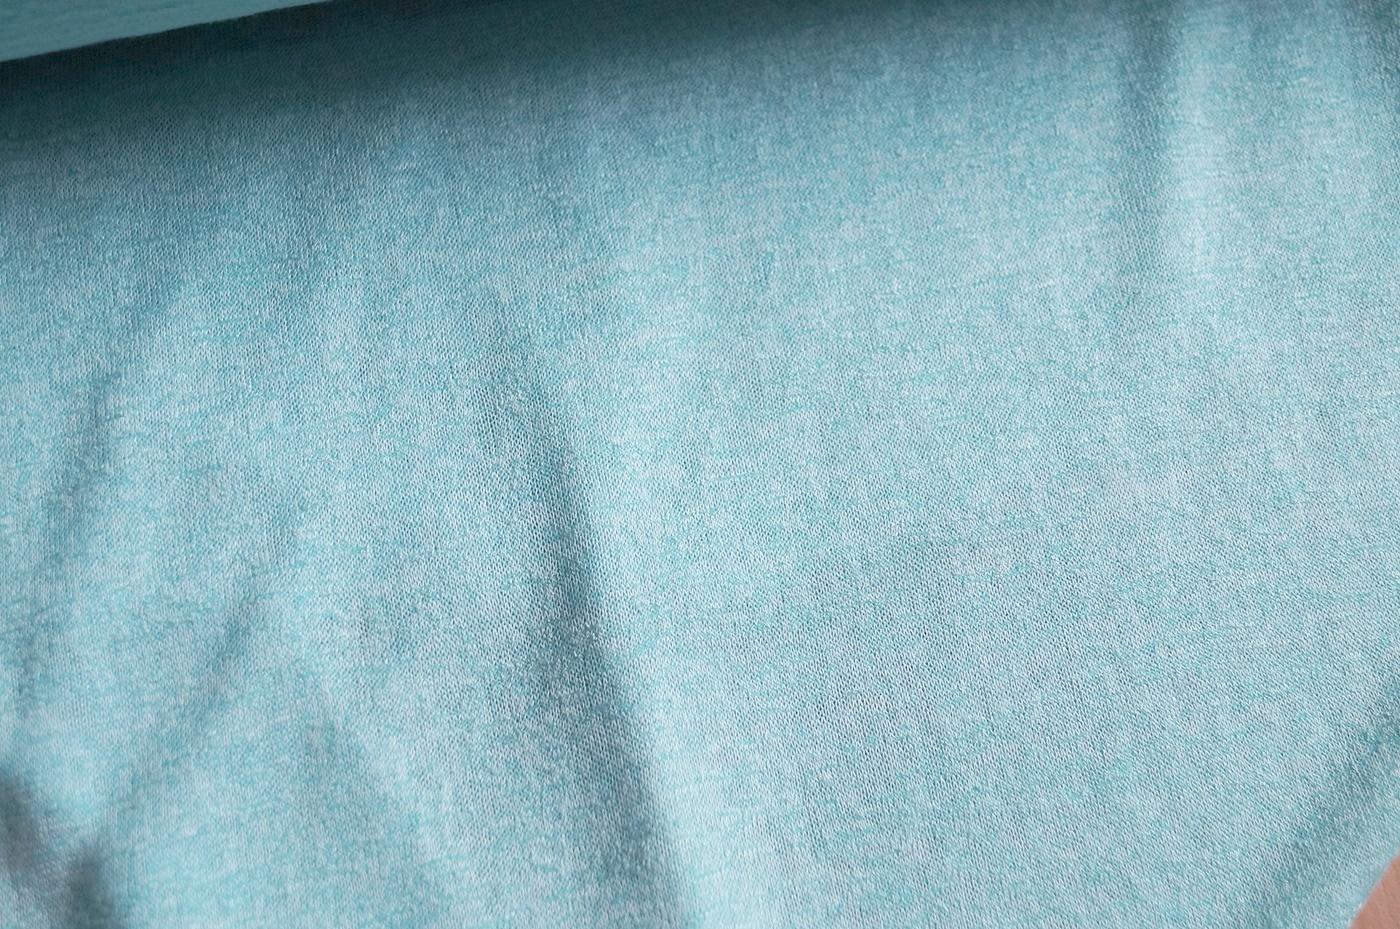 online stoffe kaufen feinstrick stoff hellblau meliert. Black Bedroom Furniture Sets. Home Design Ideas